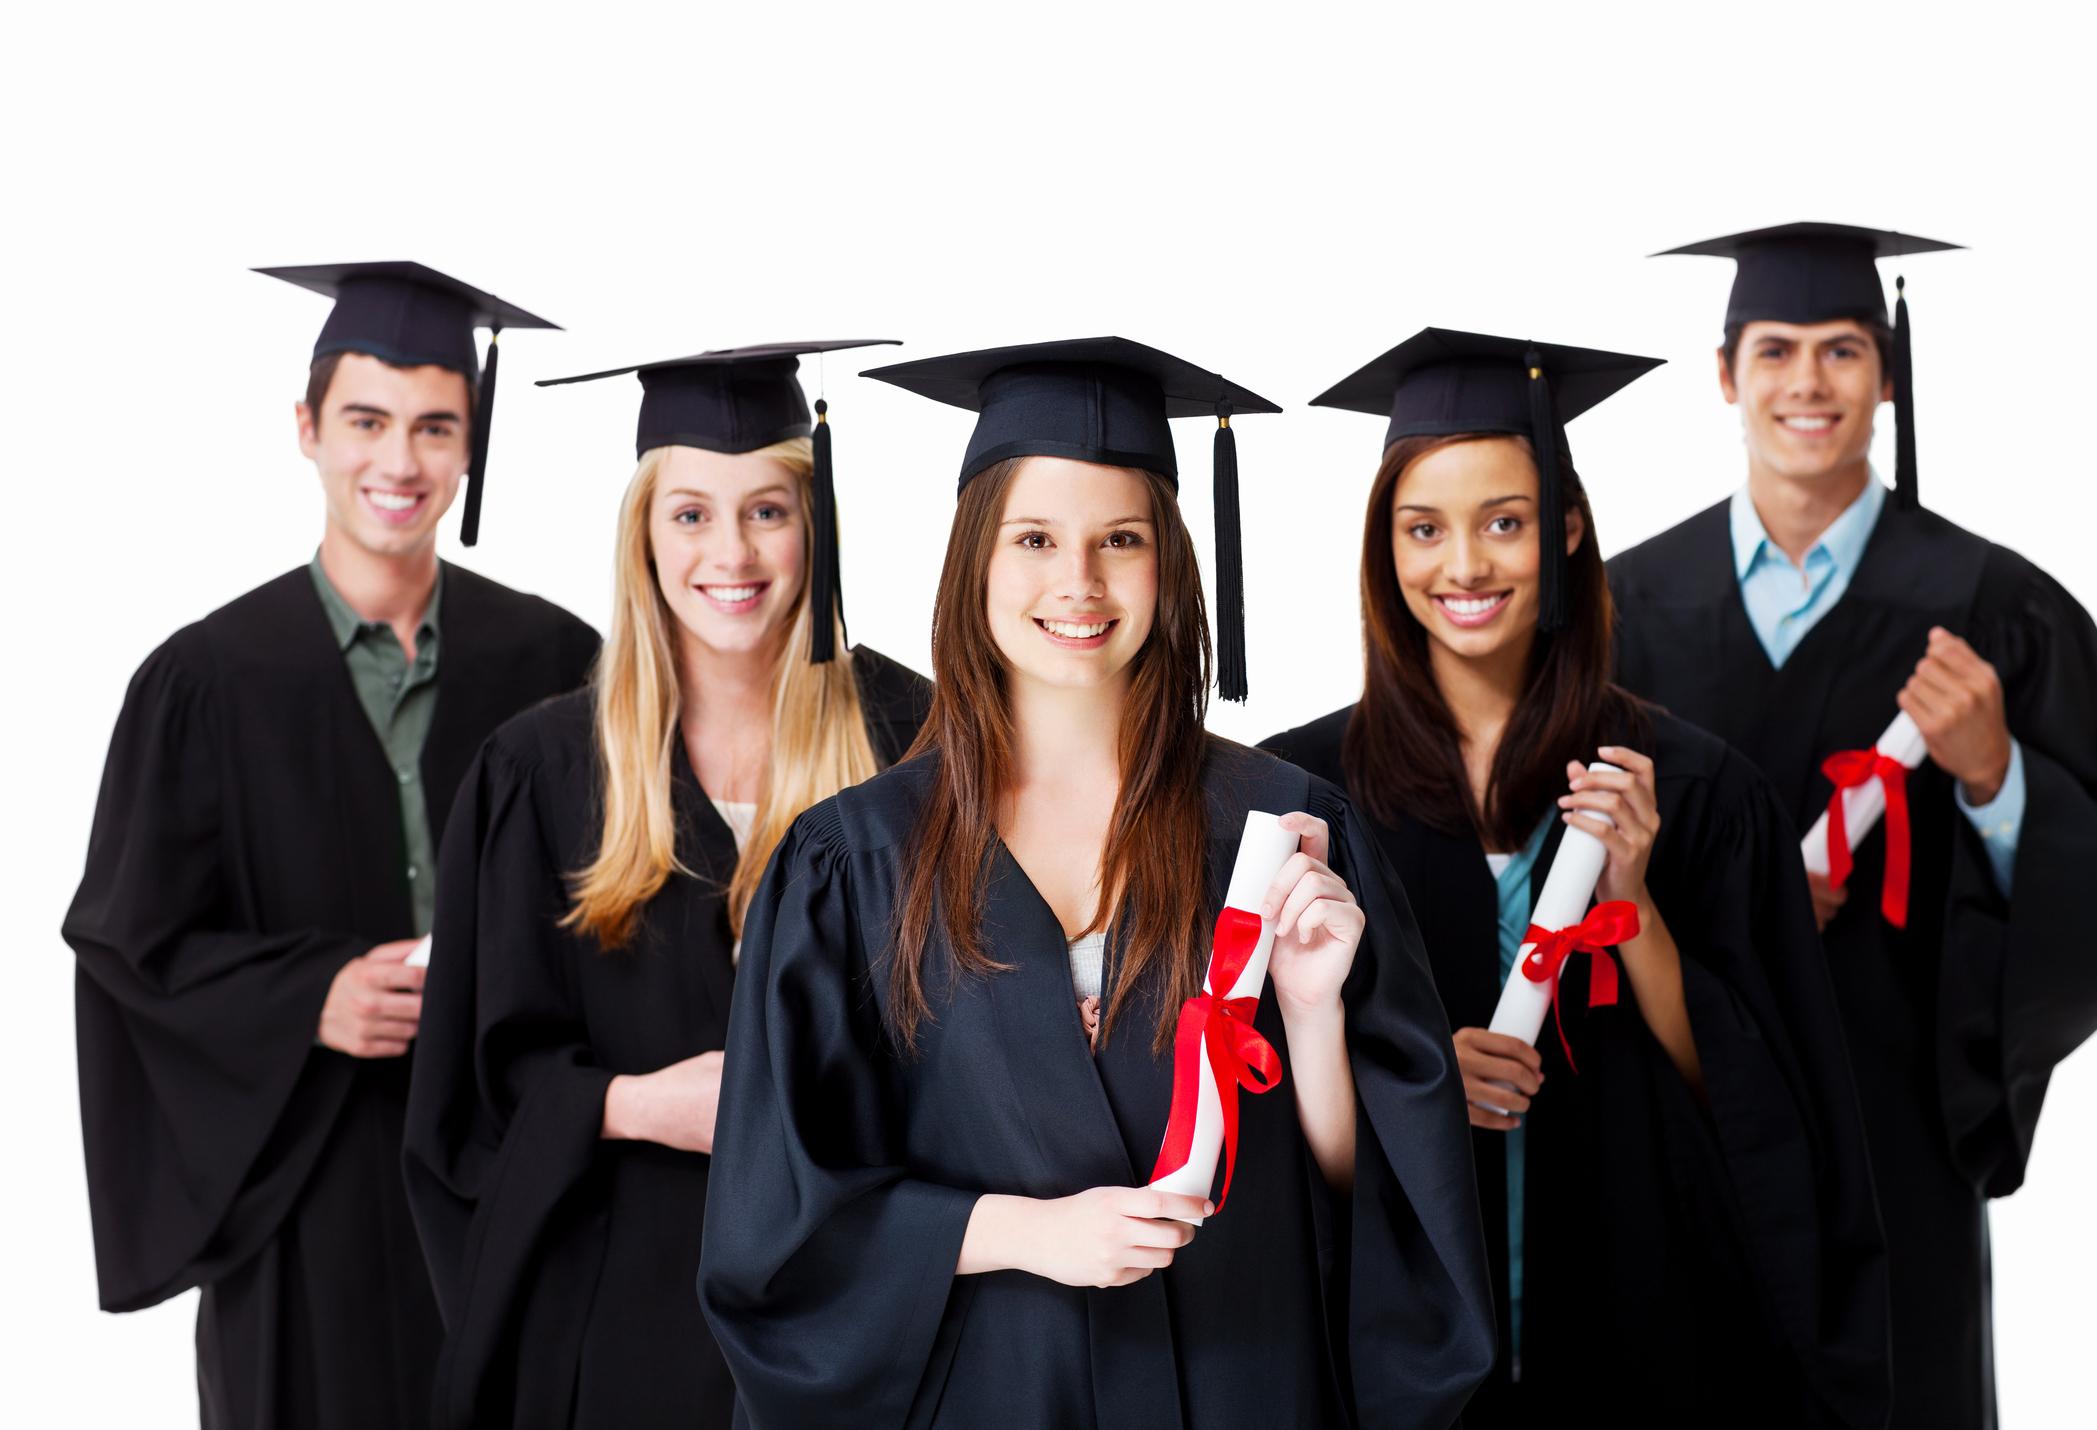 graduation ceremony ideas - Graduation Gowns